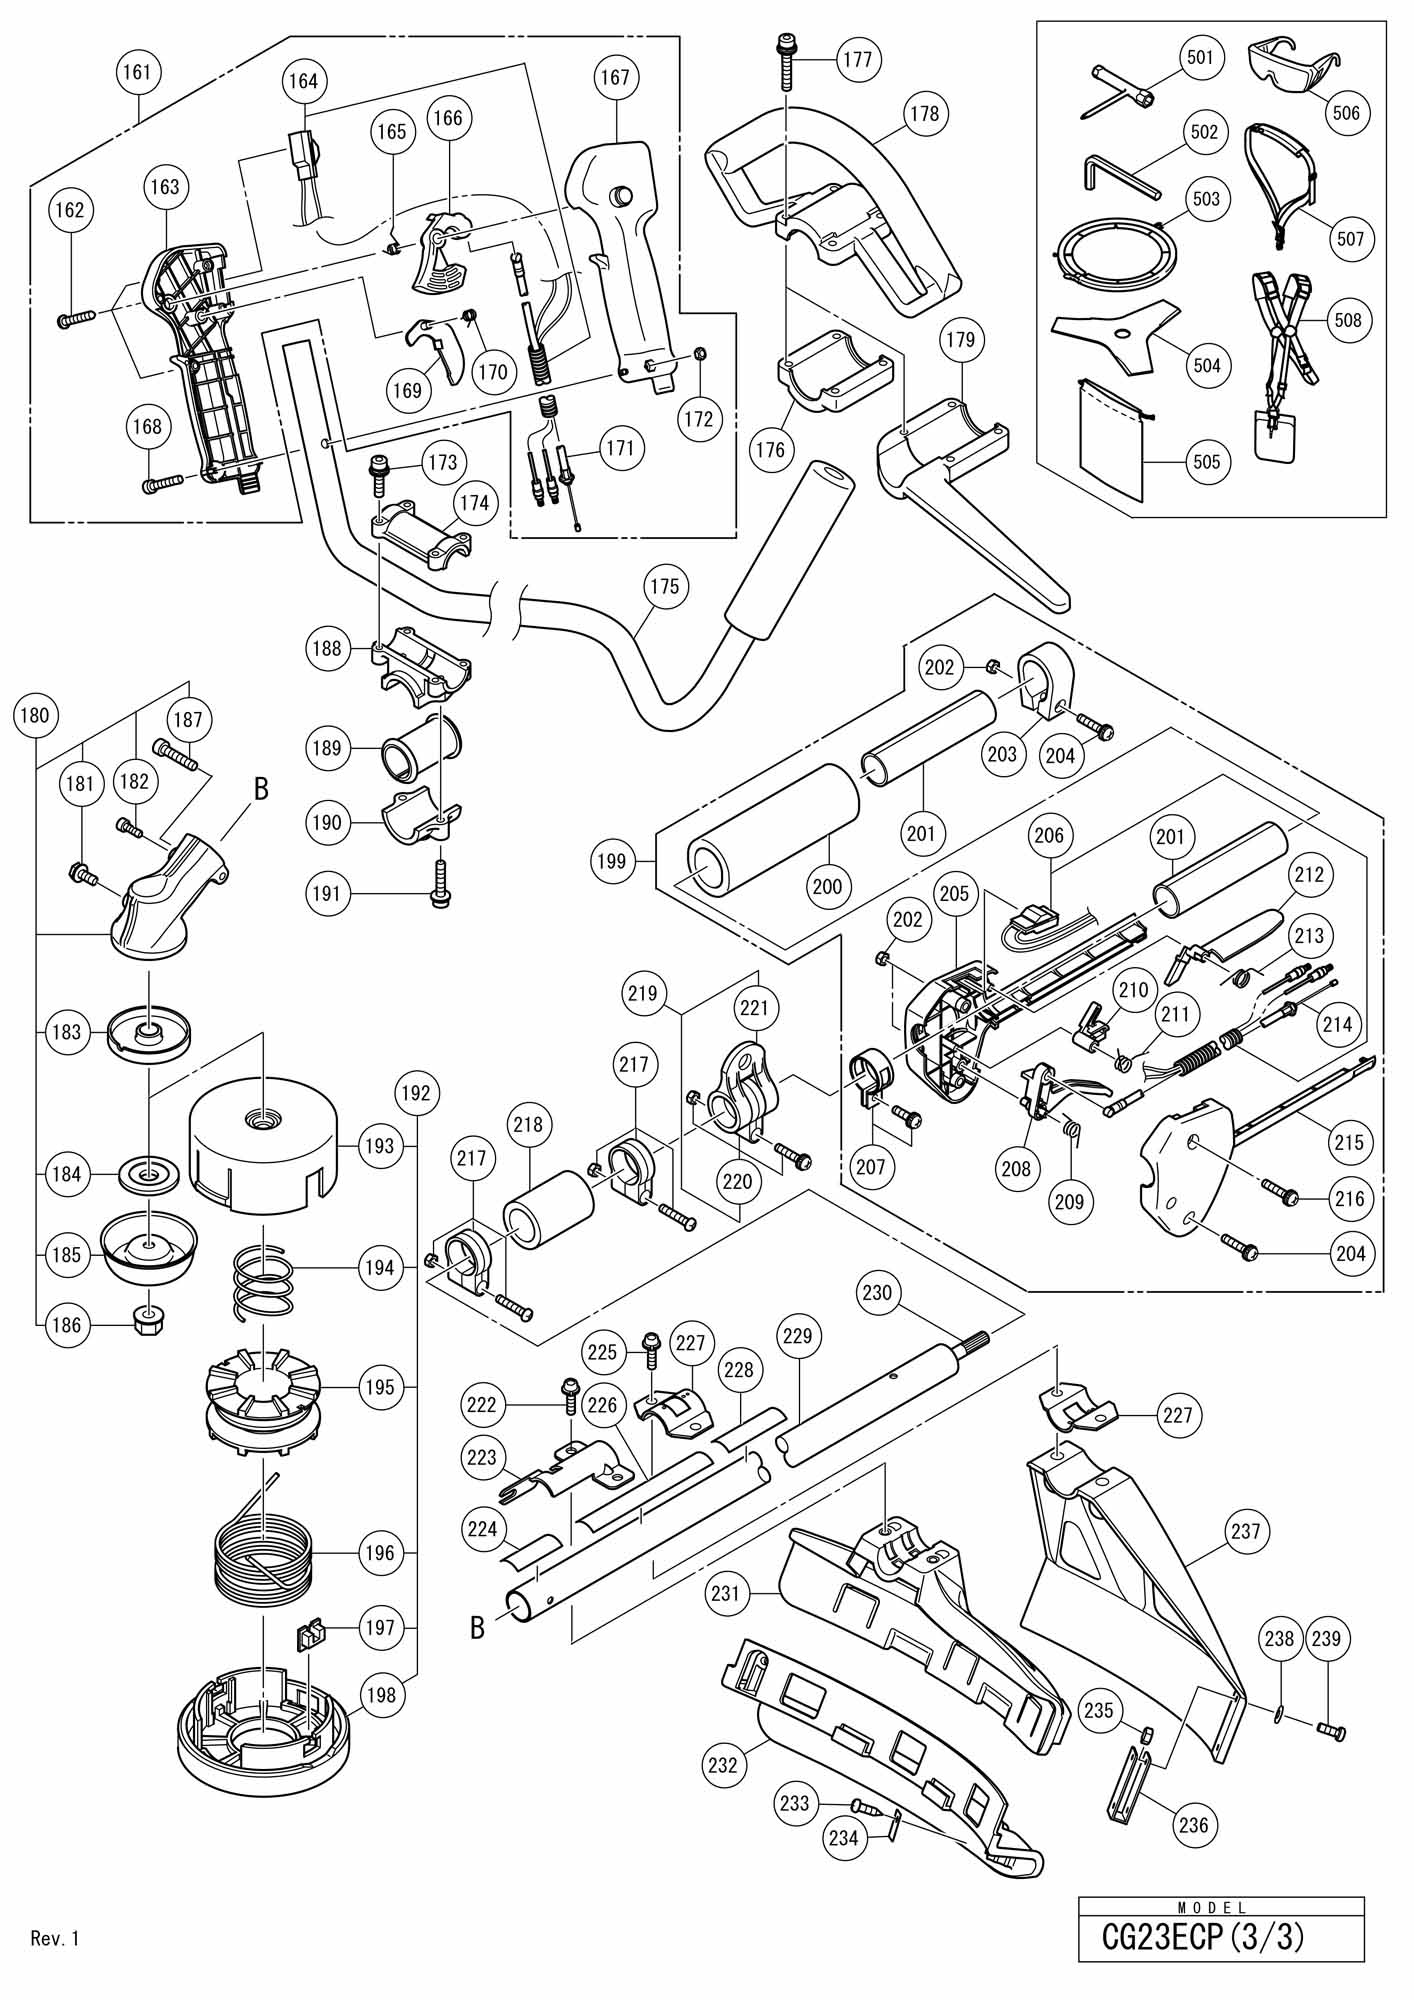 Hitachi Engine Grass Trimmer/brush Cutter Cg 23ecp SPARE